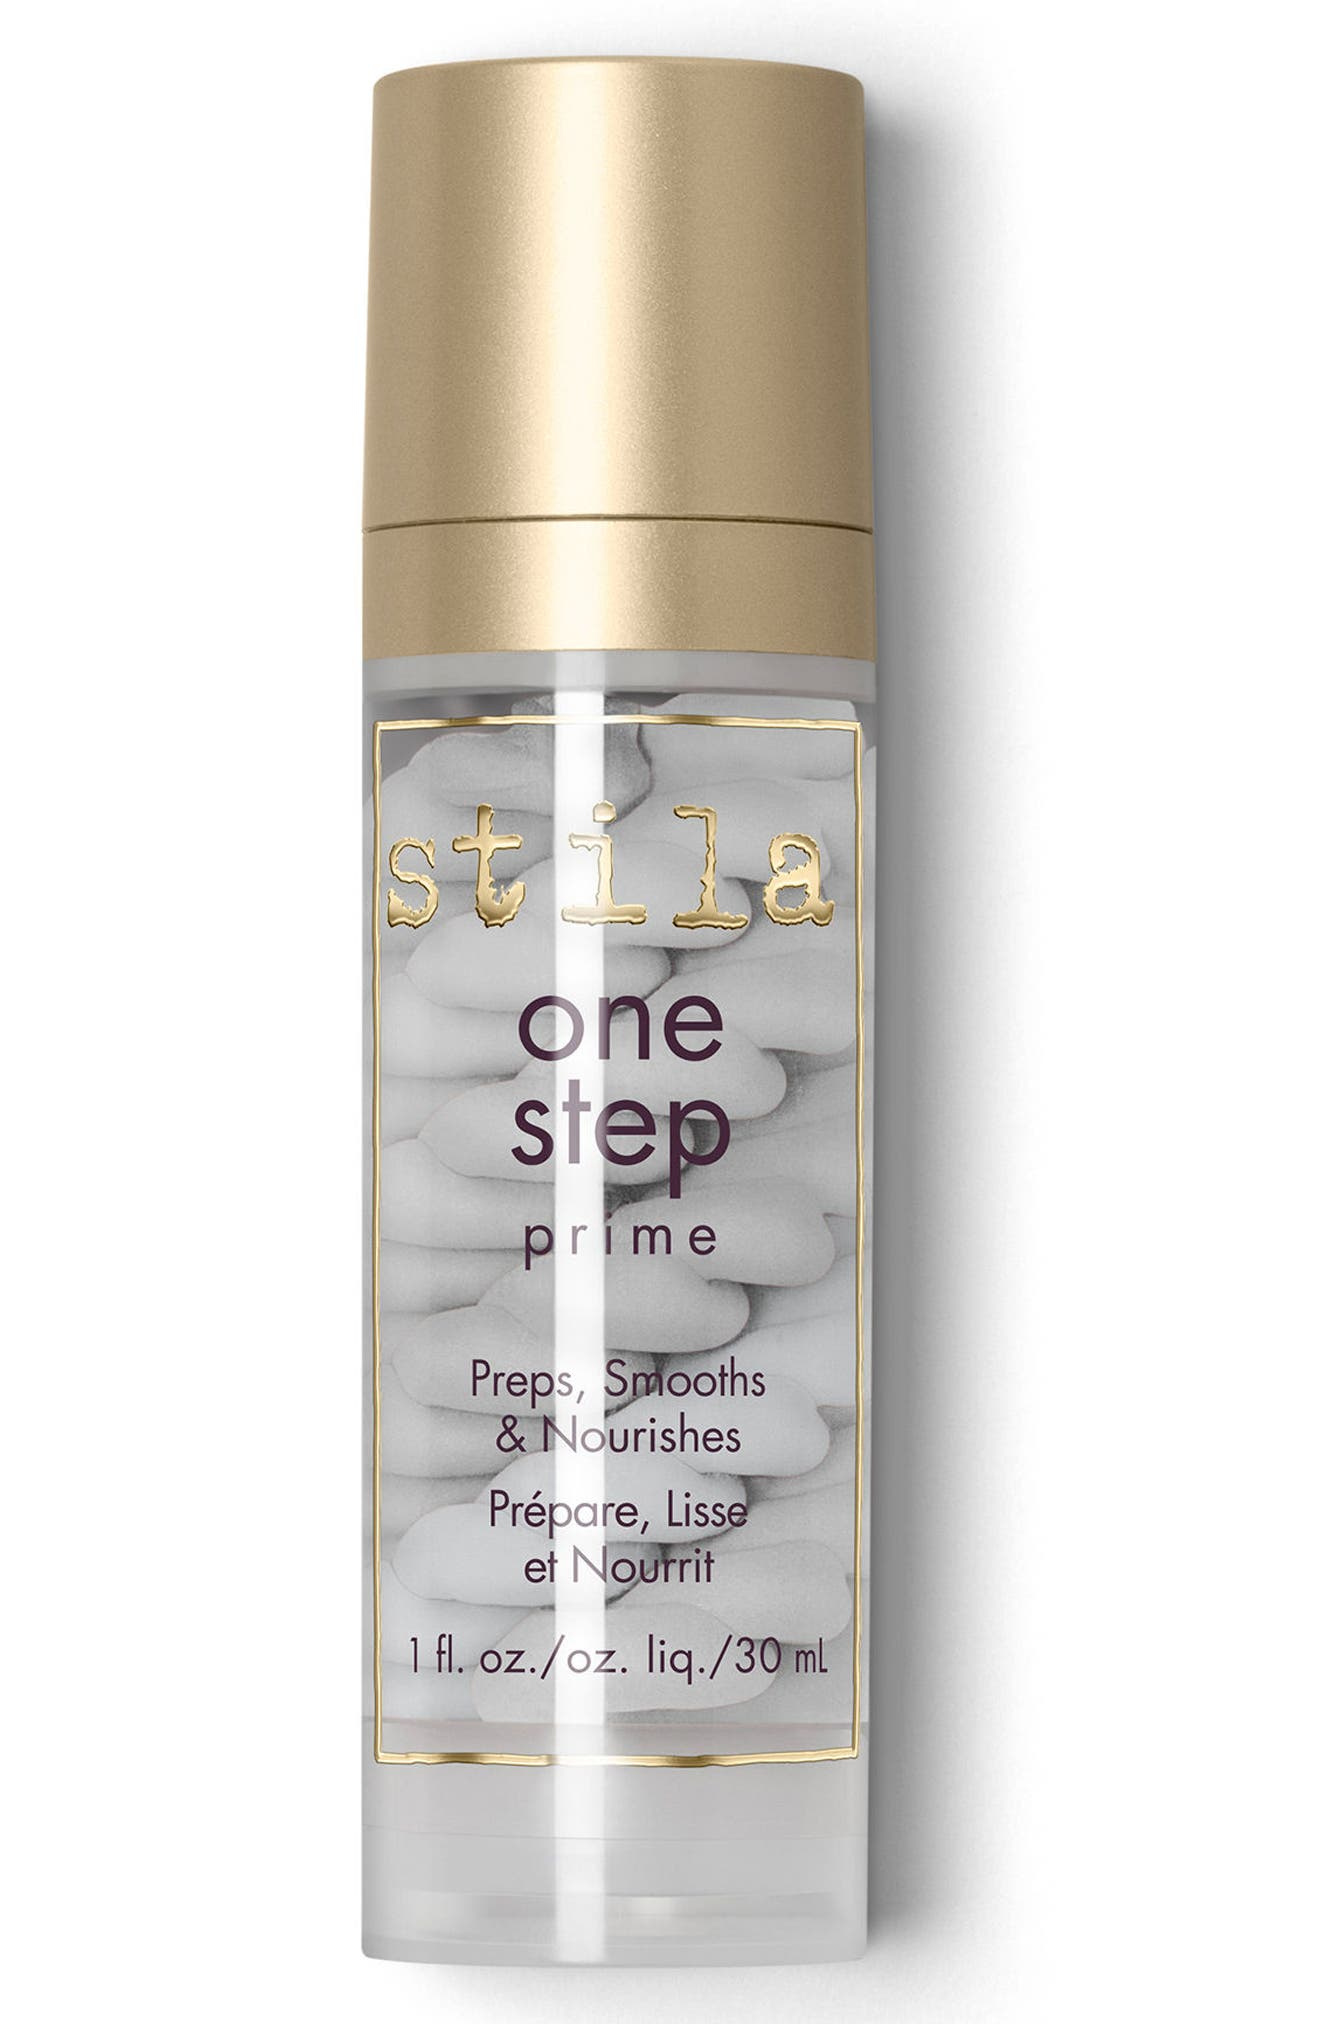 Stila One Step Prime Serum Primer